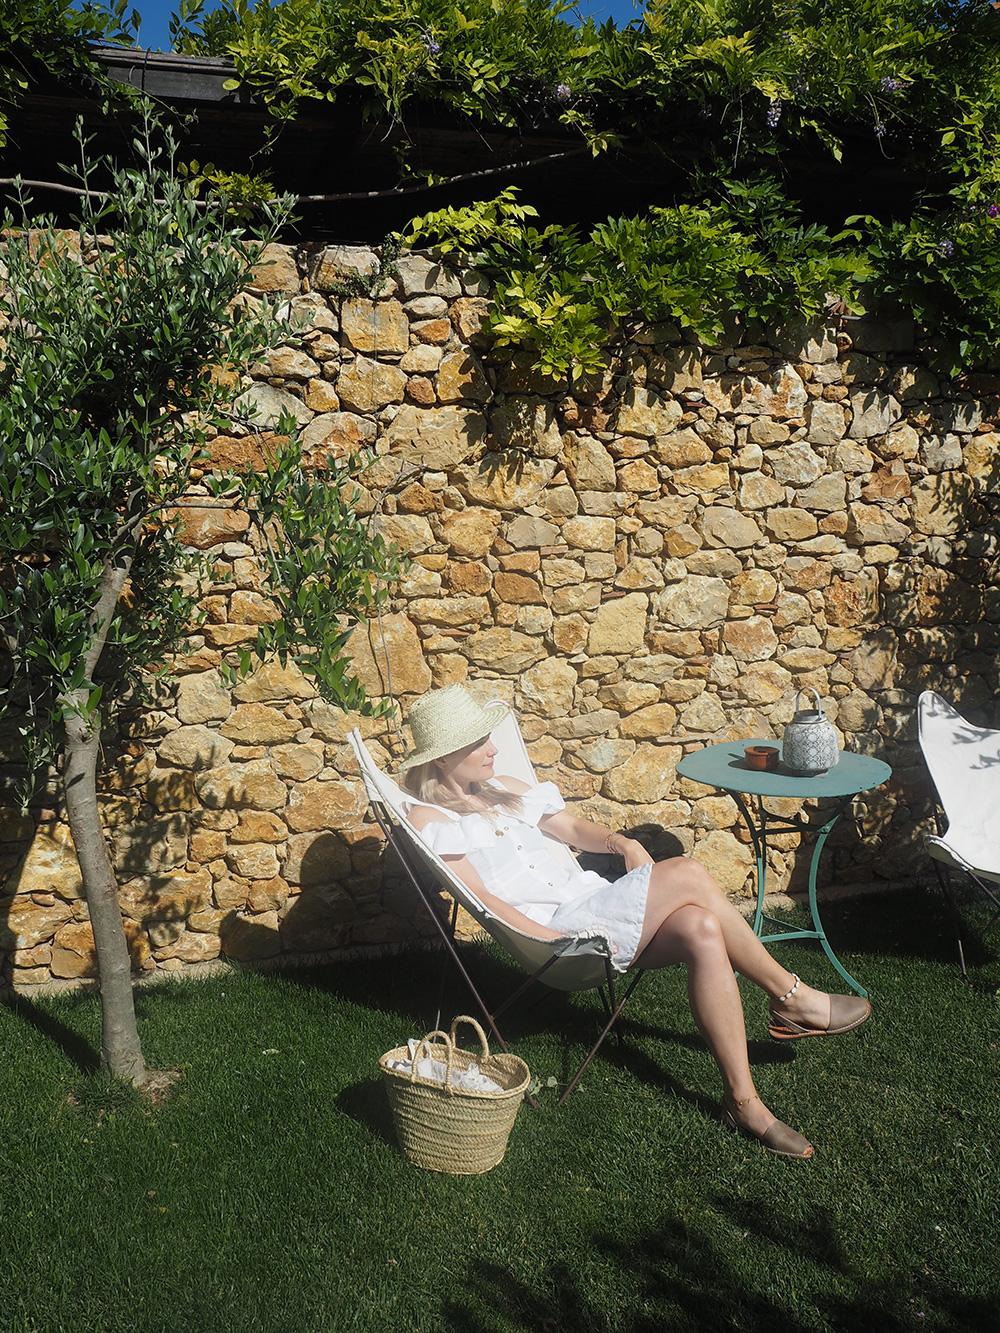 RosyCheeks-Les-Hamaques-garden-1